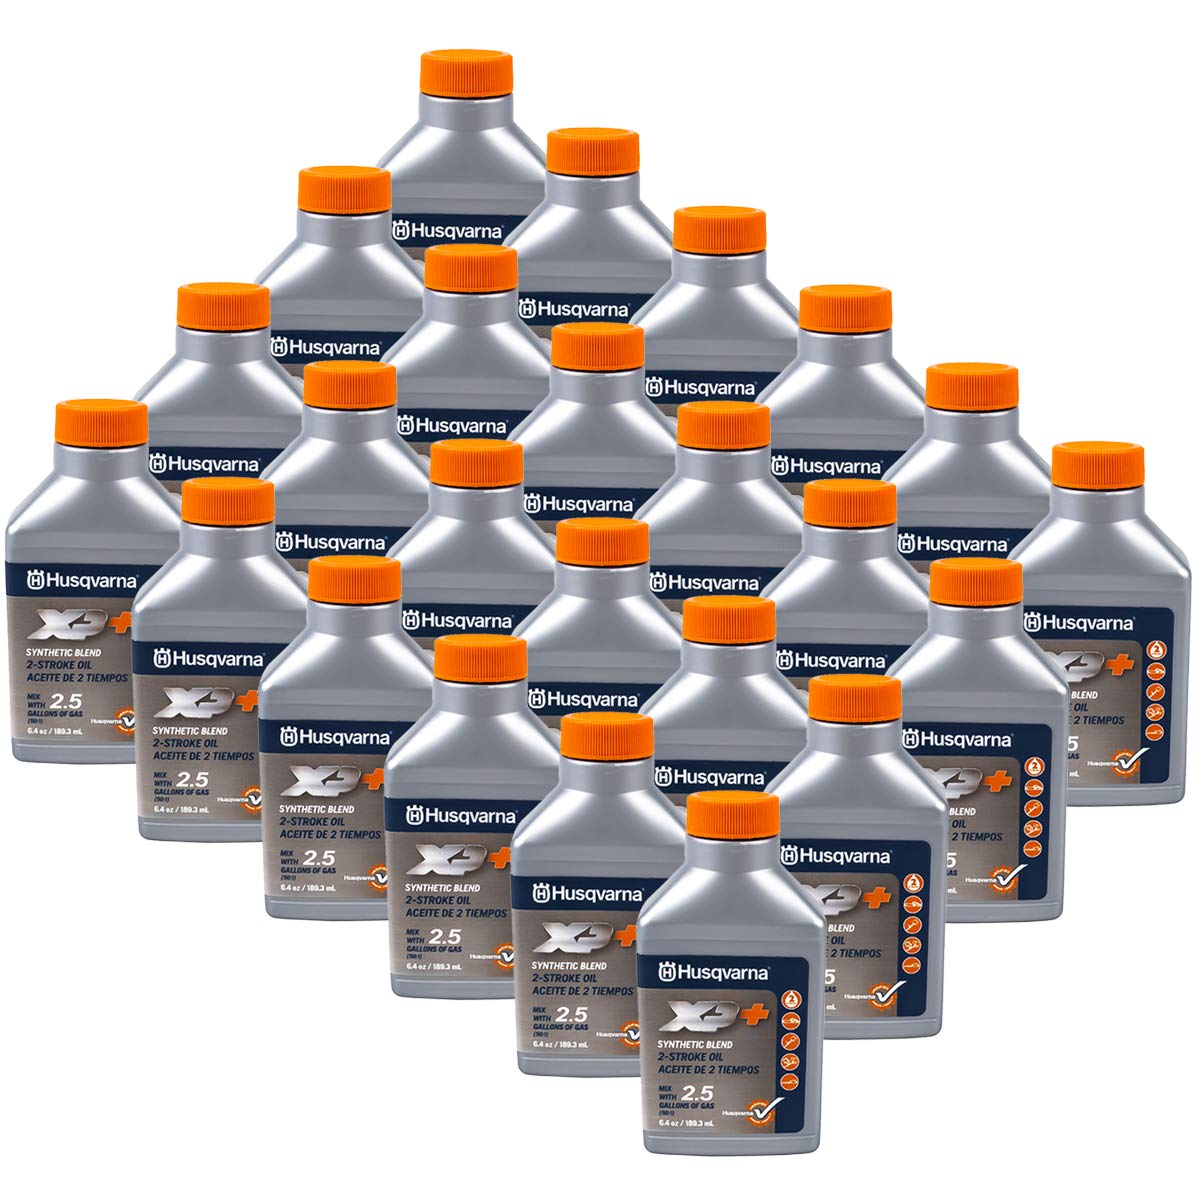 Husqvarna 24PK Genuine OEM XP 2-Cycle Oil 2.5 Gallon Mix 6.4oz 593152303